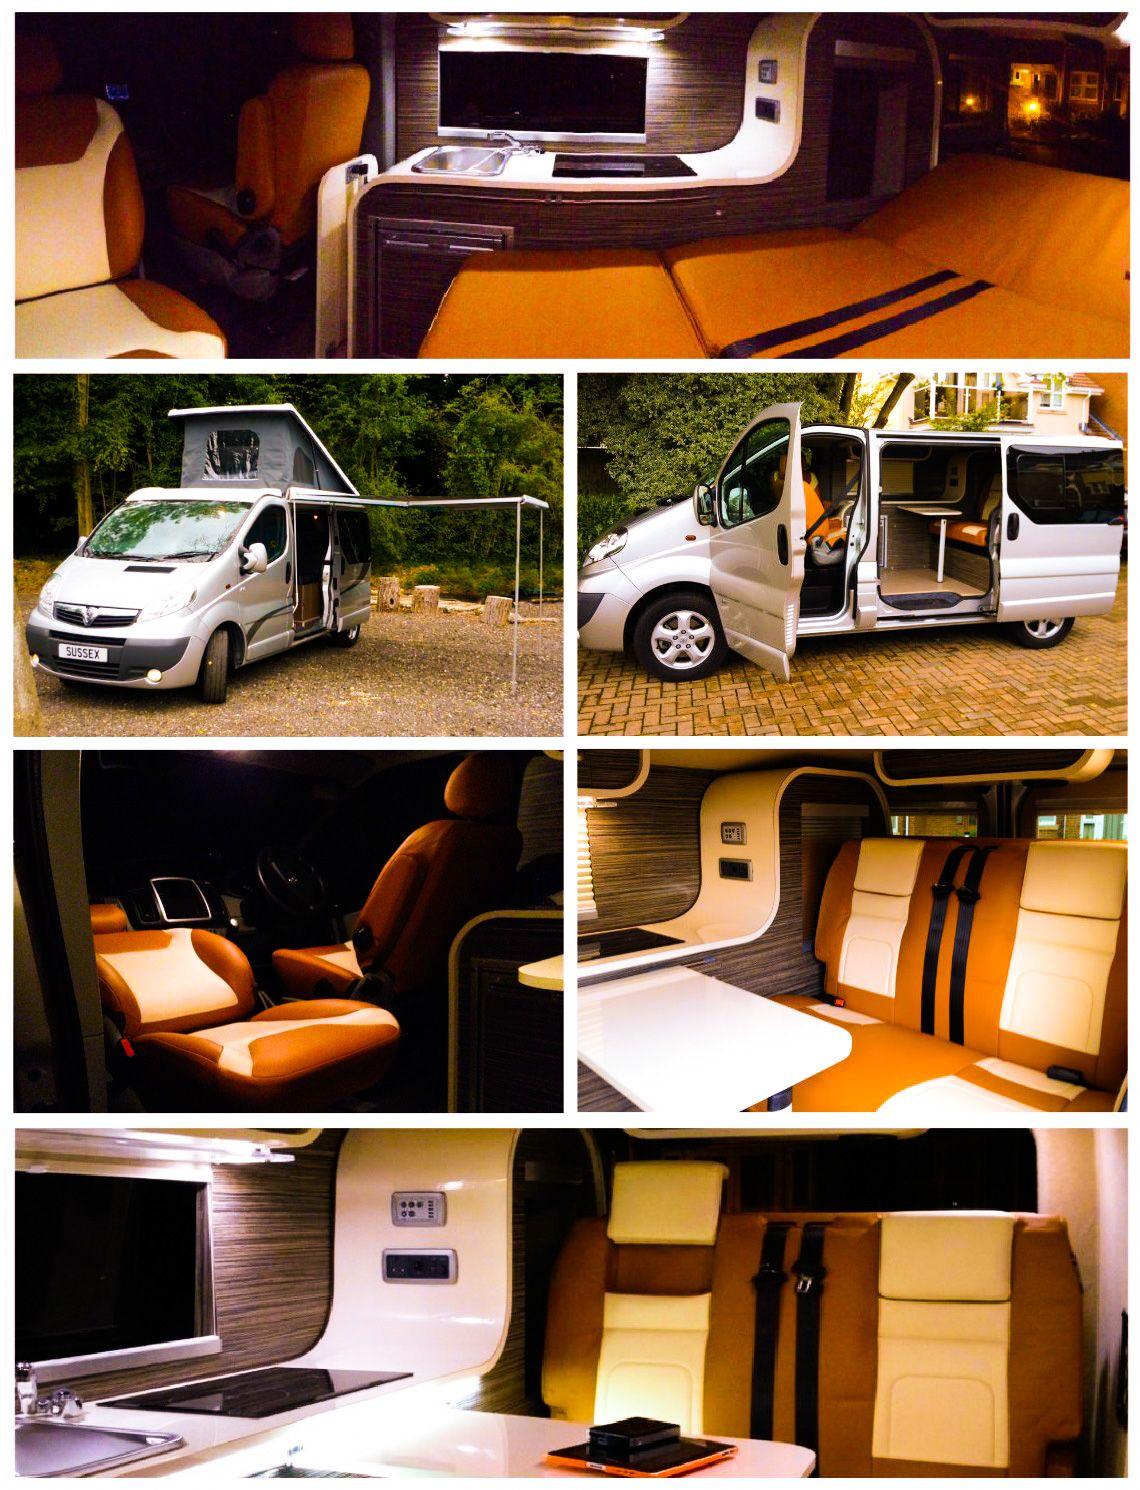 61 vauxhall vivaro sportive camper van 147ps luxury camper suv conversion http